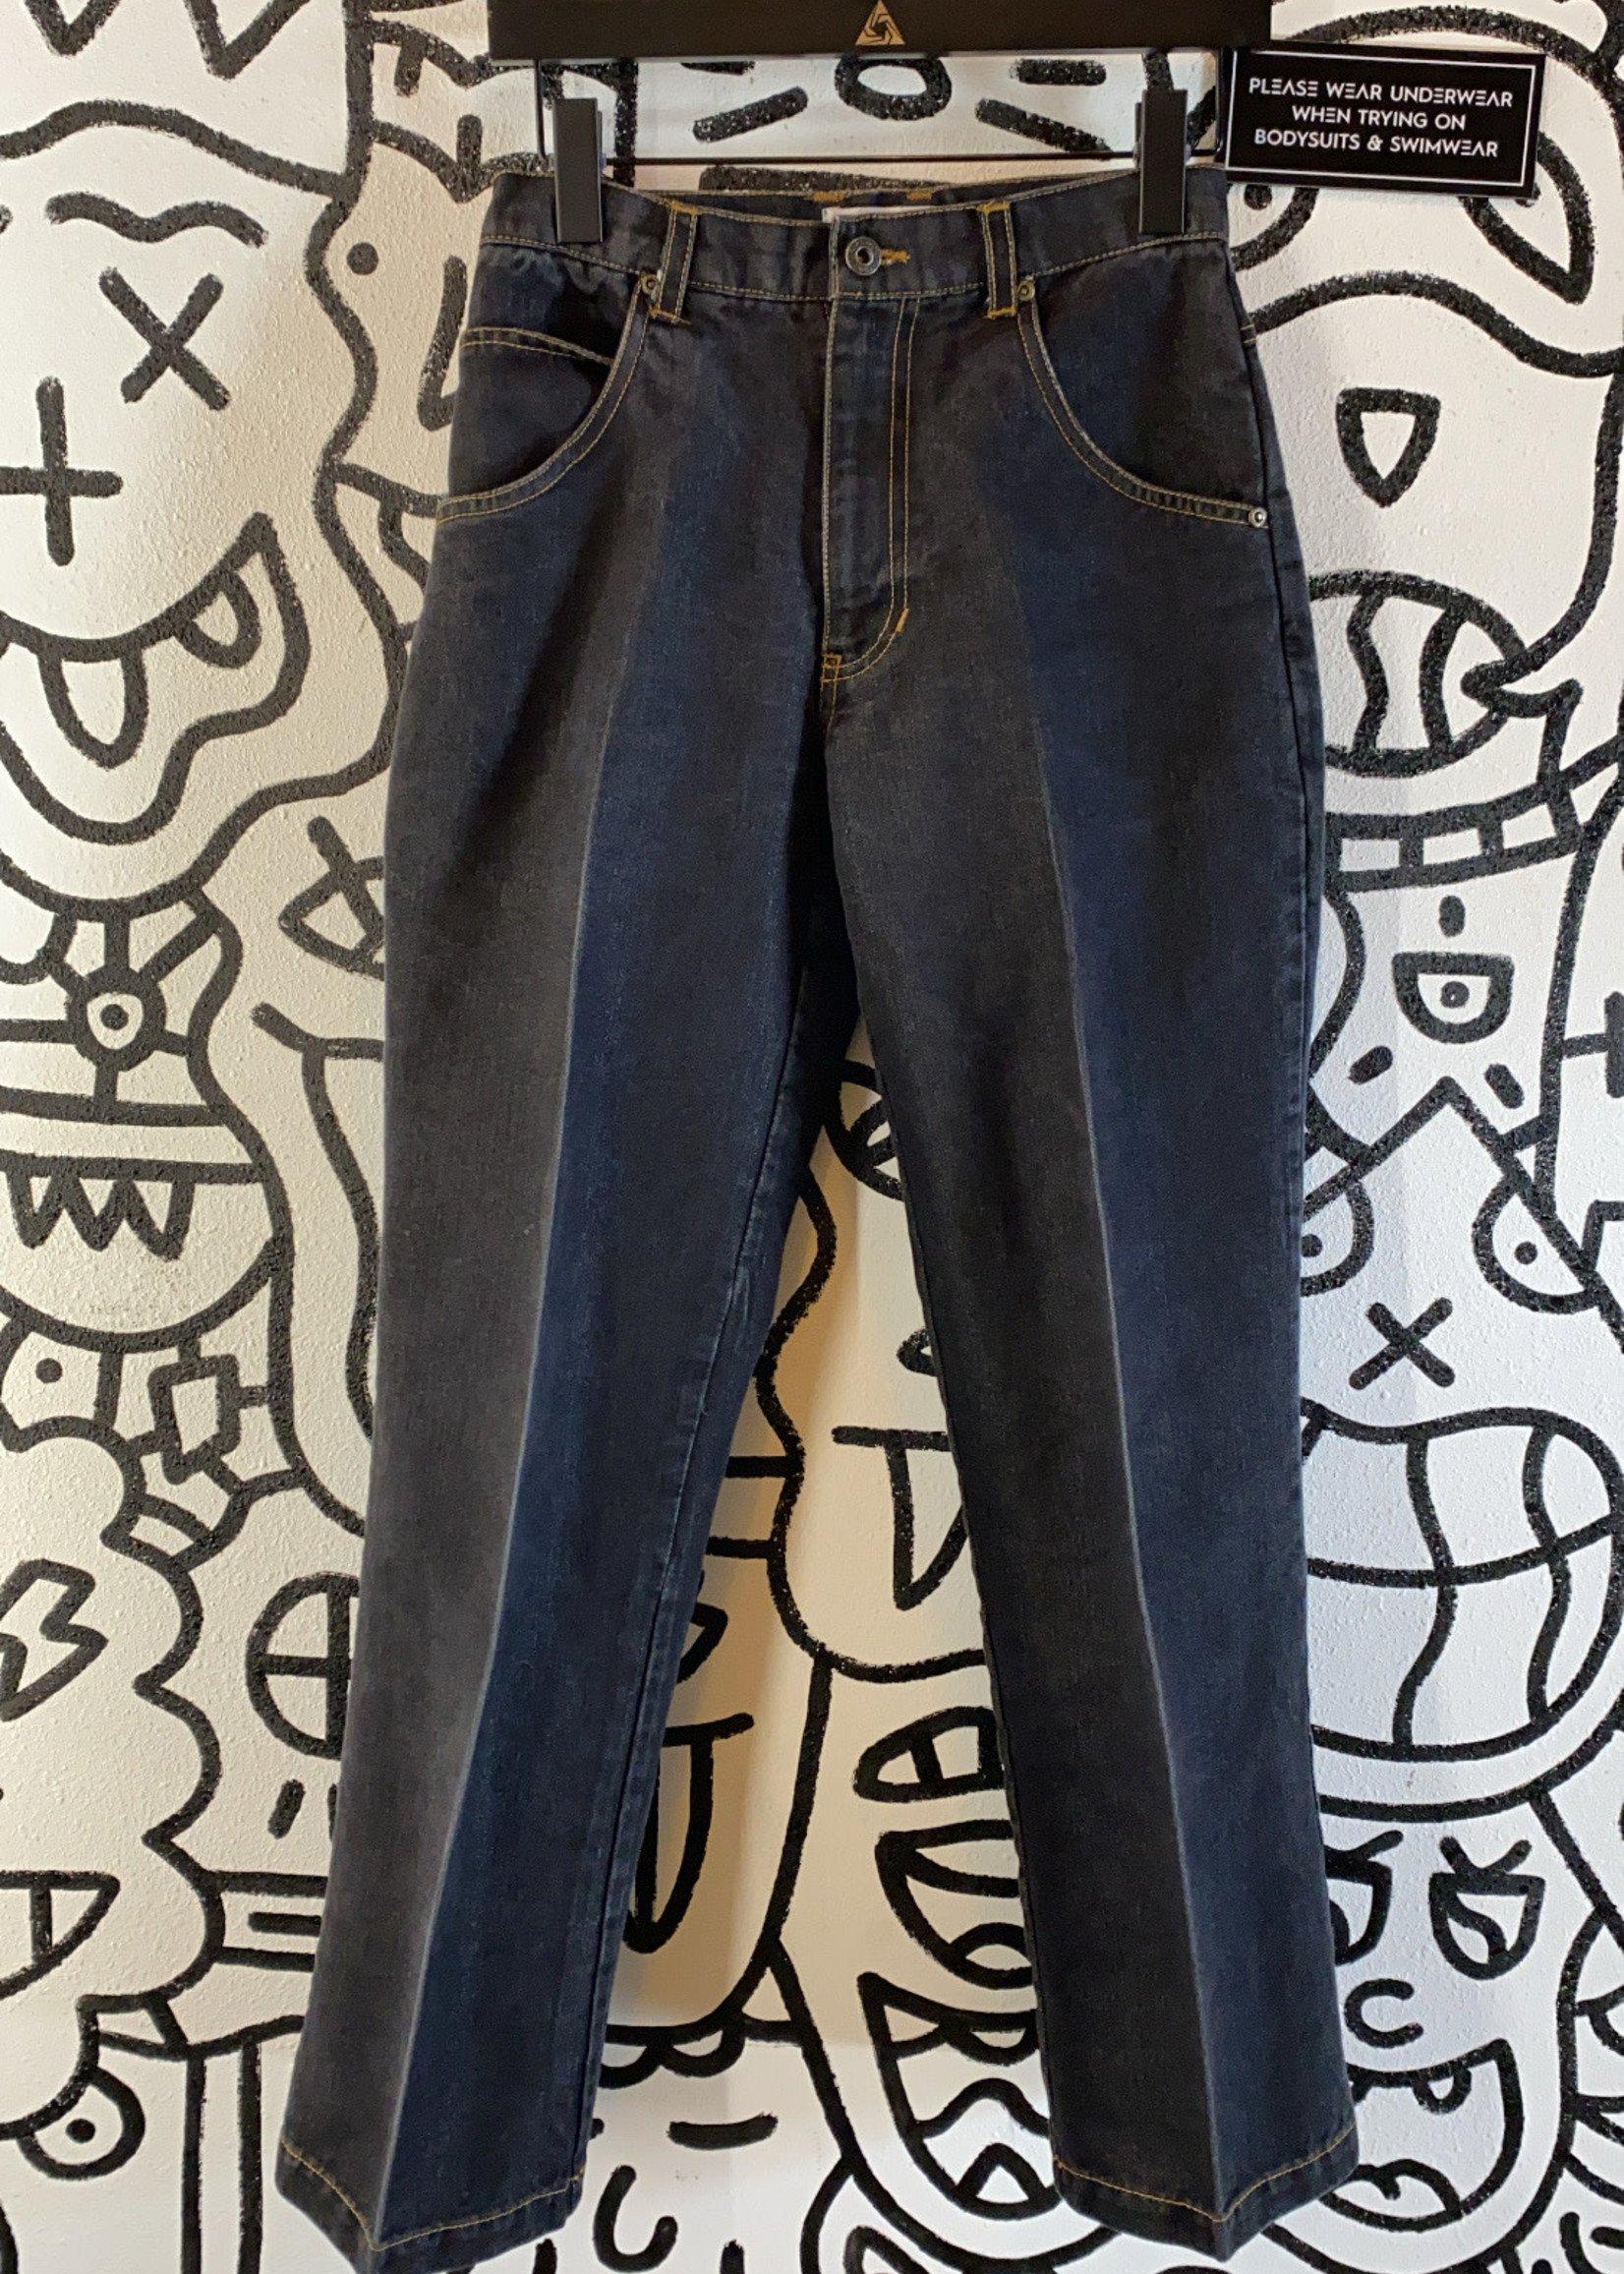 Ultra Pink Black Straight Cut Jeans 27